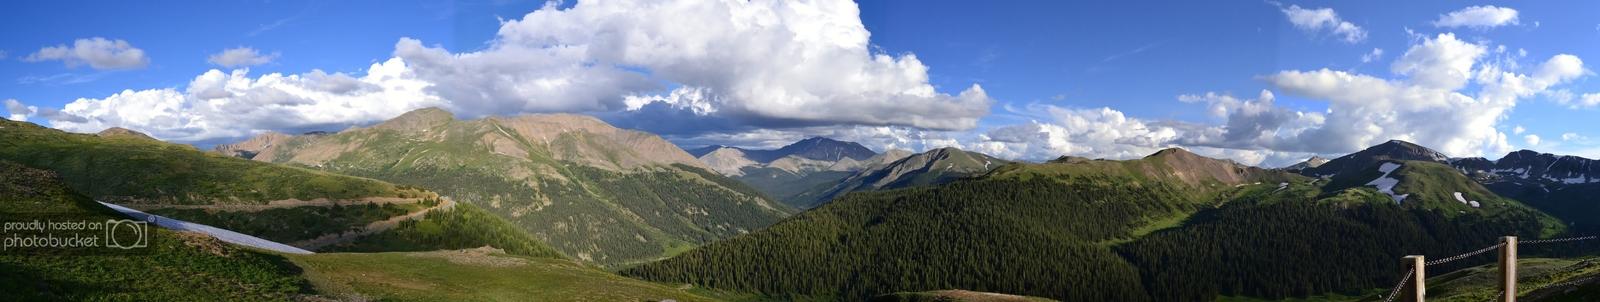 ColoradoTrip2011843_Stitch.jpg